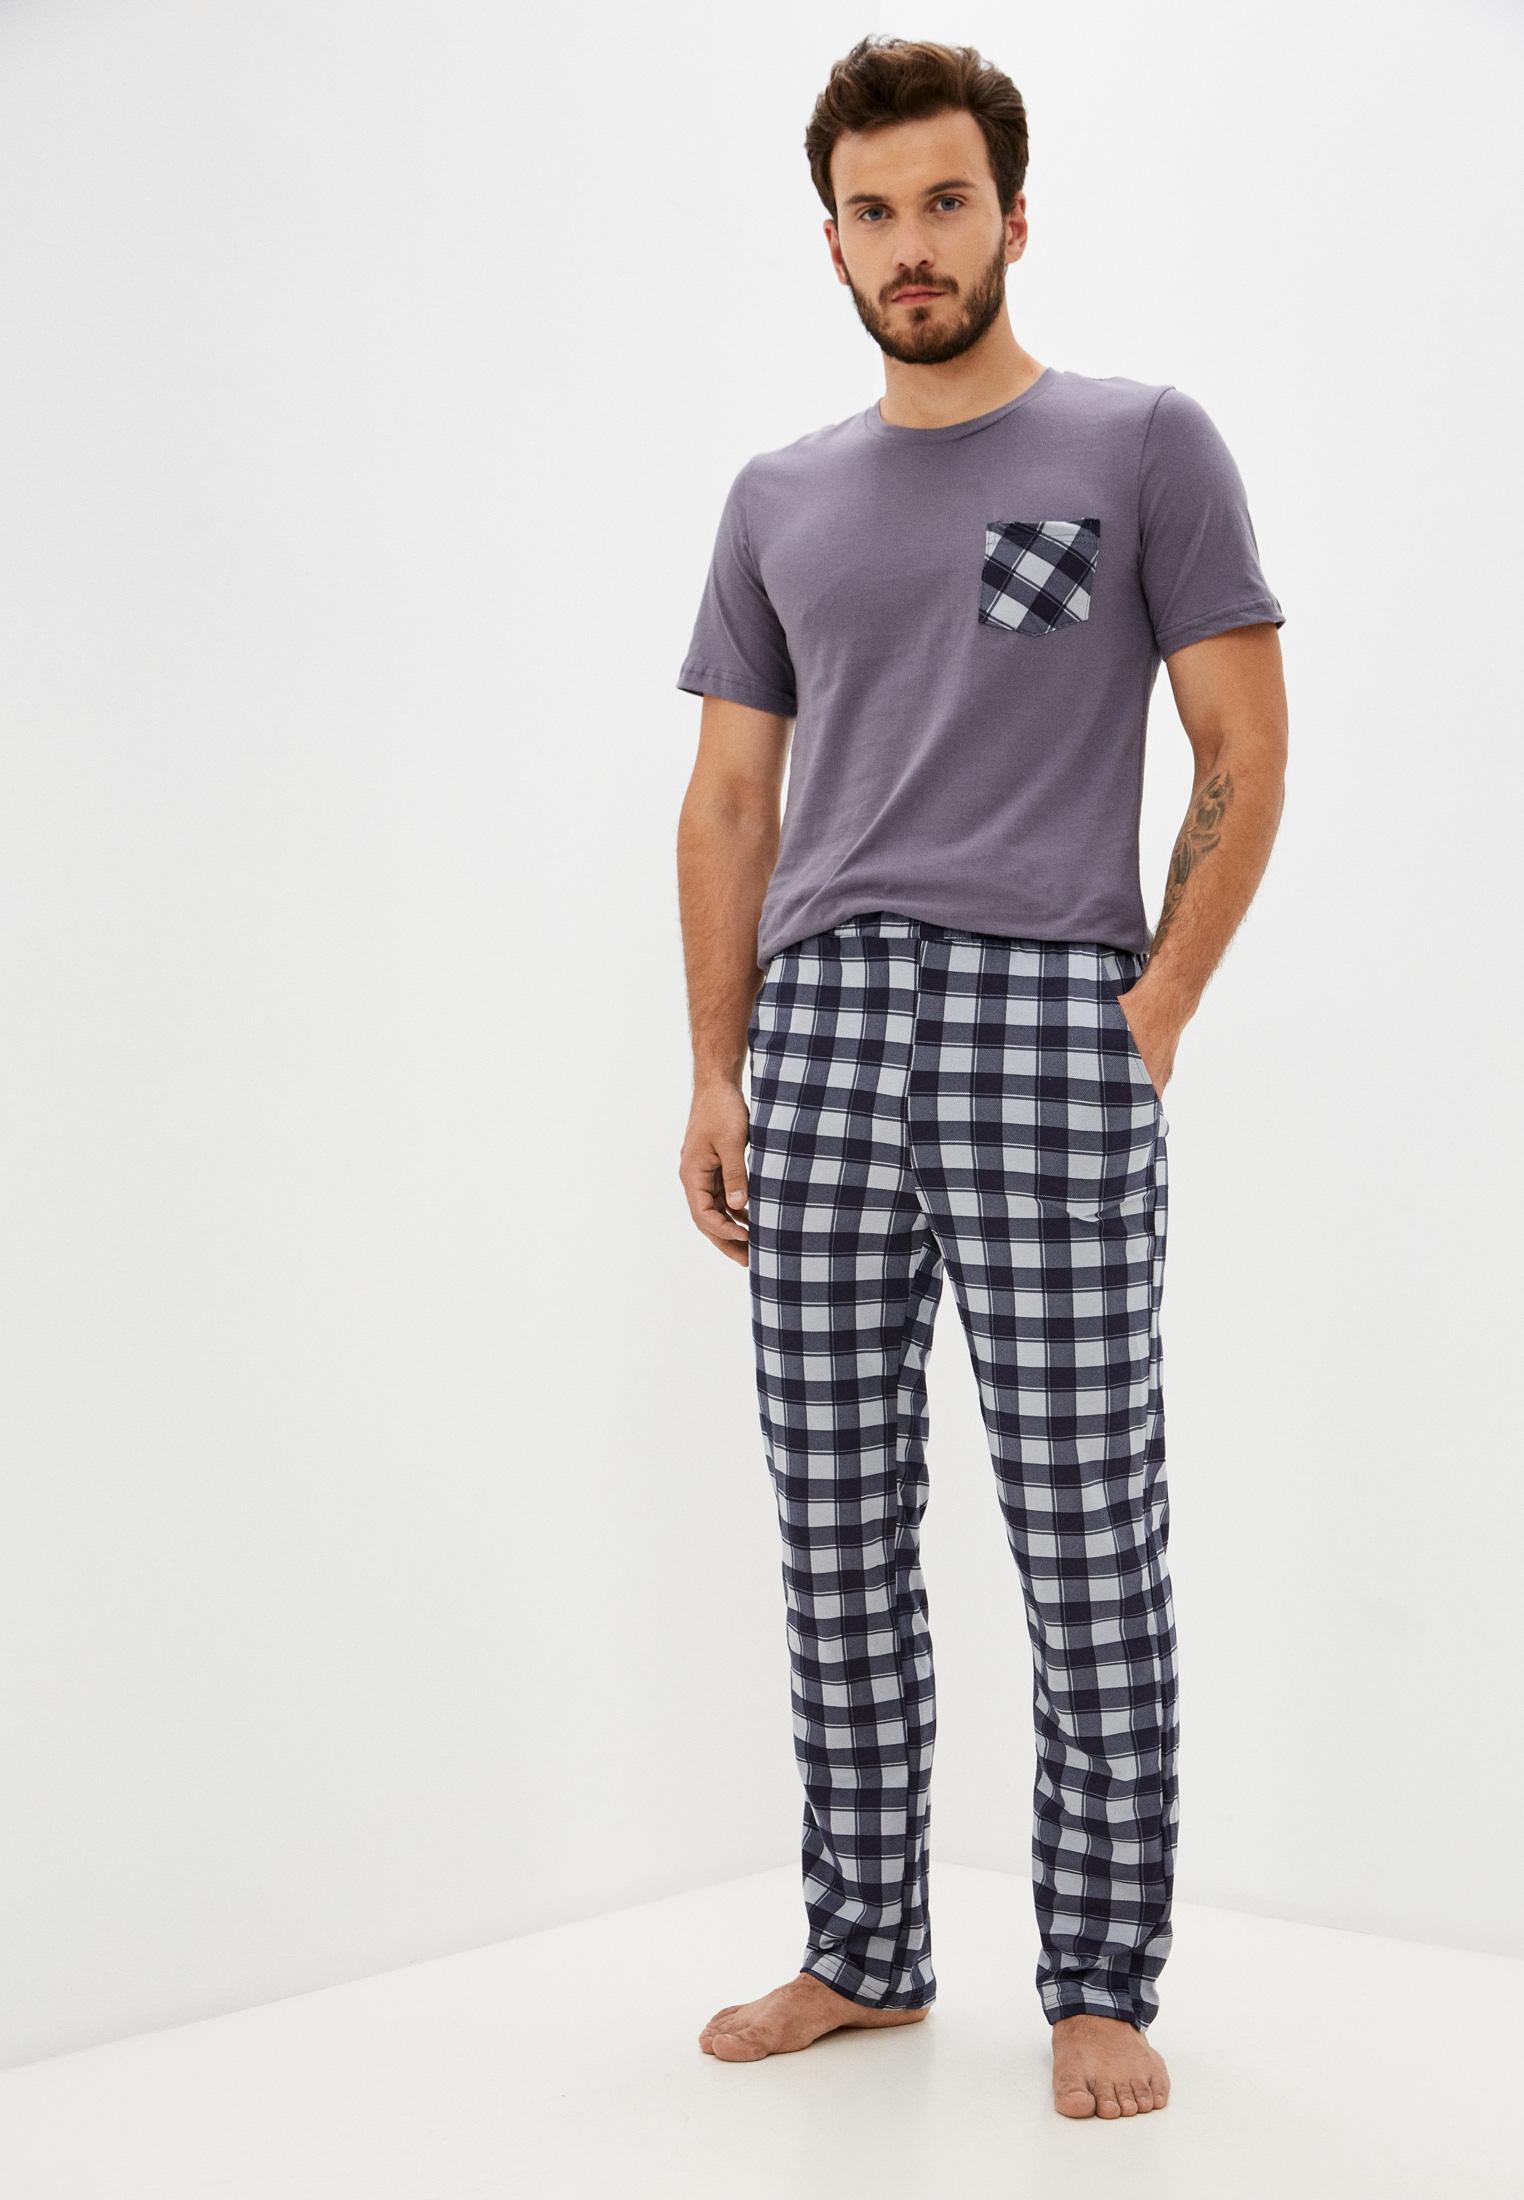 Пижама Winzor Пижама Winzor